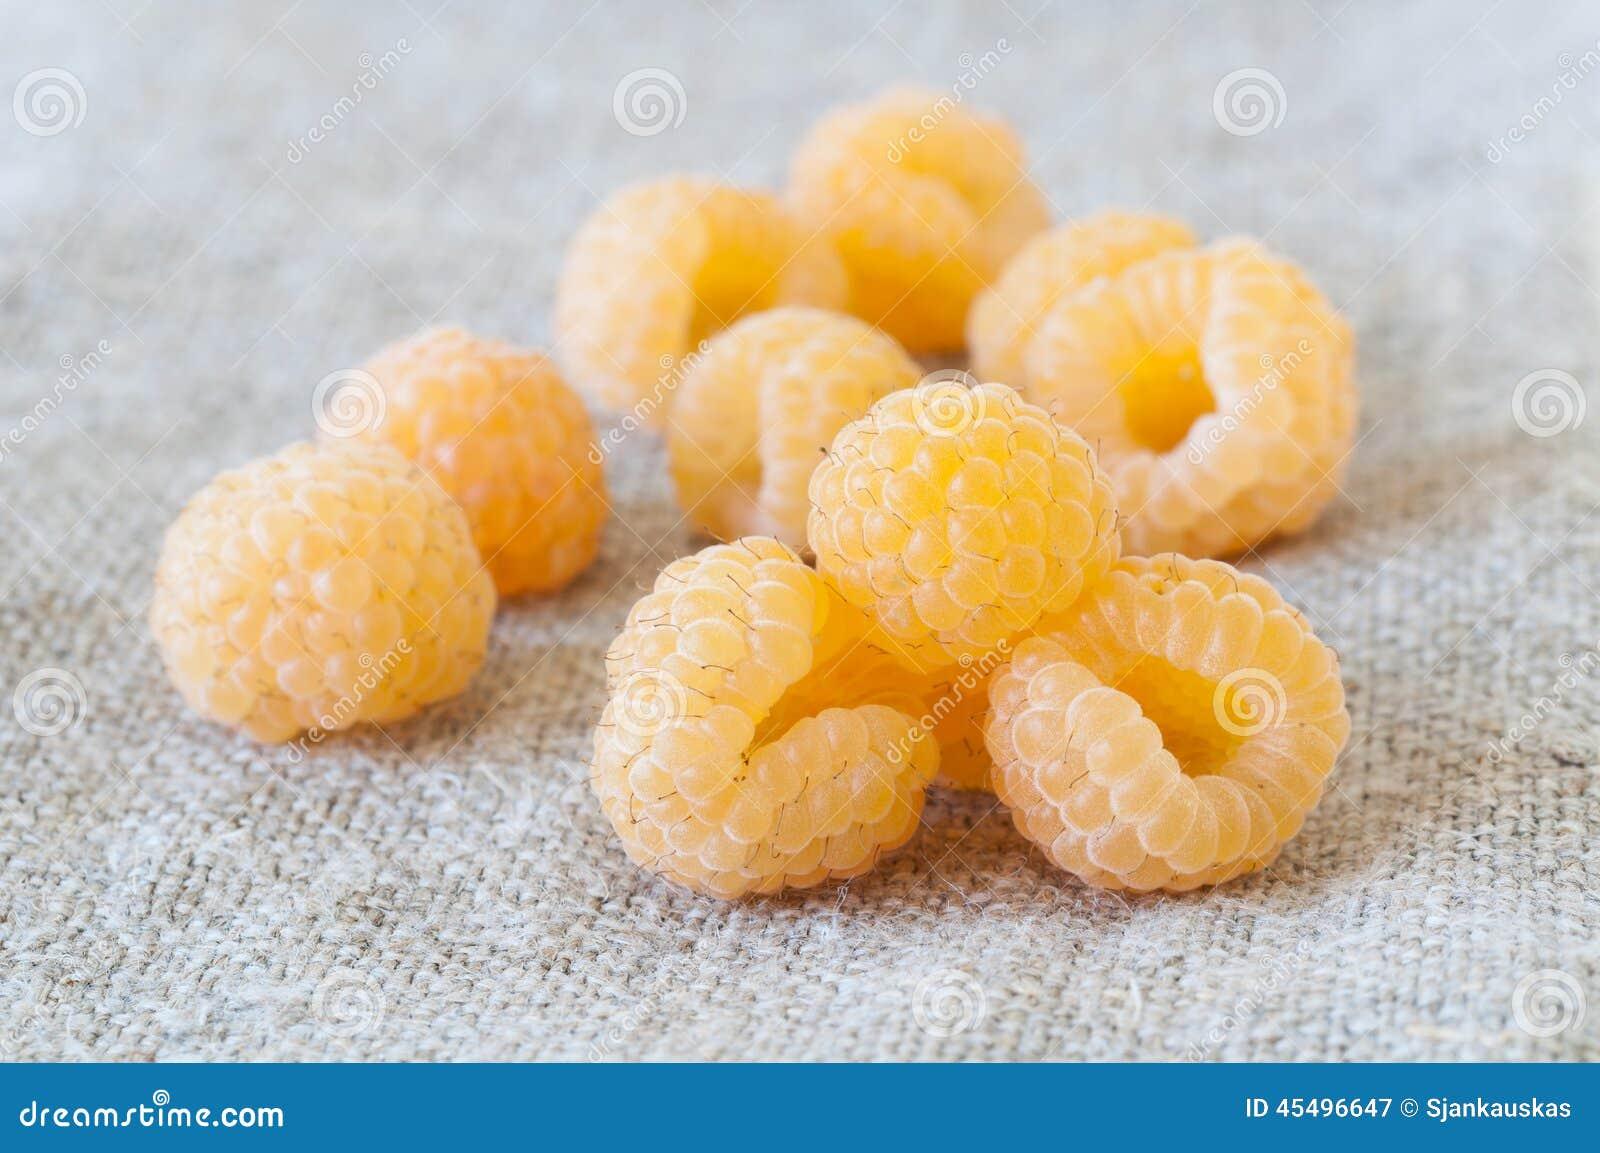 Żółte malinki